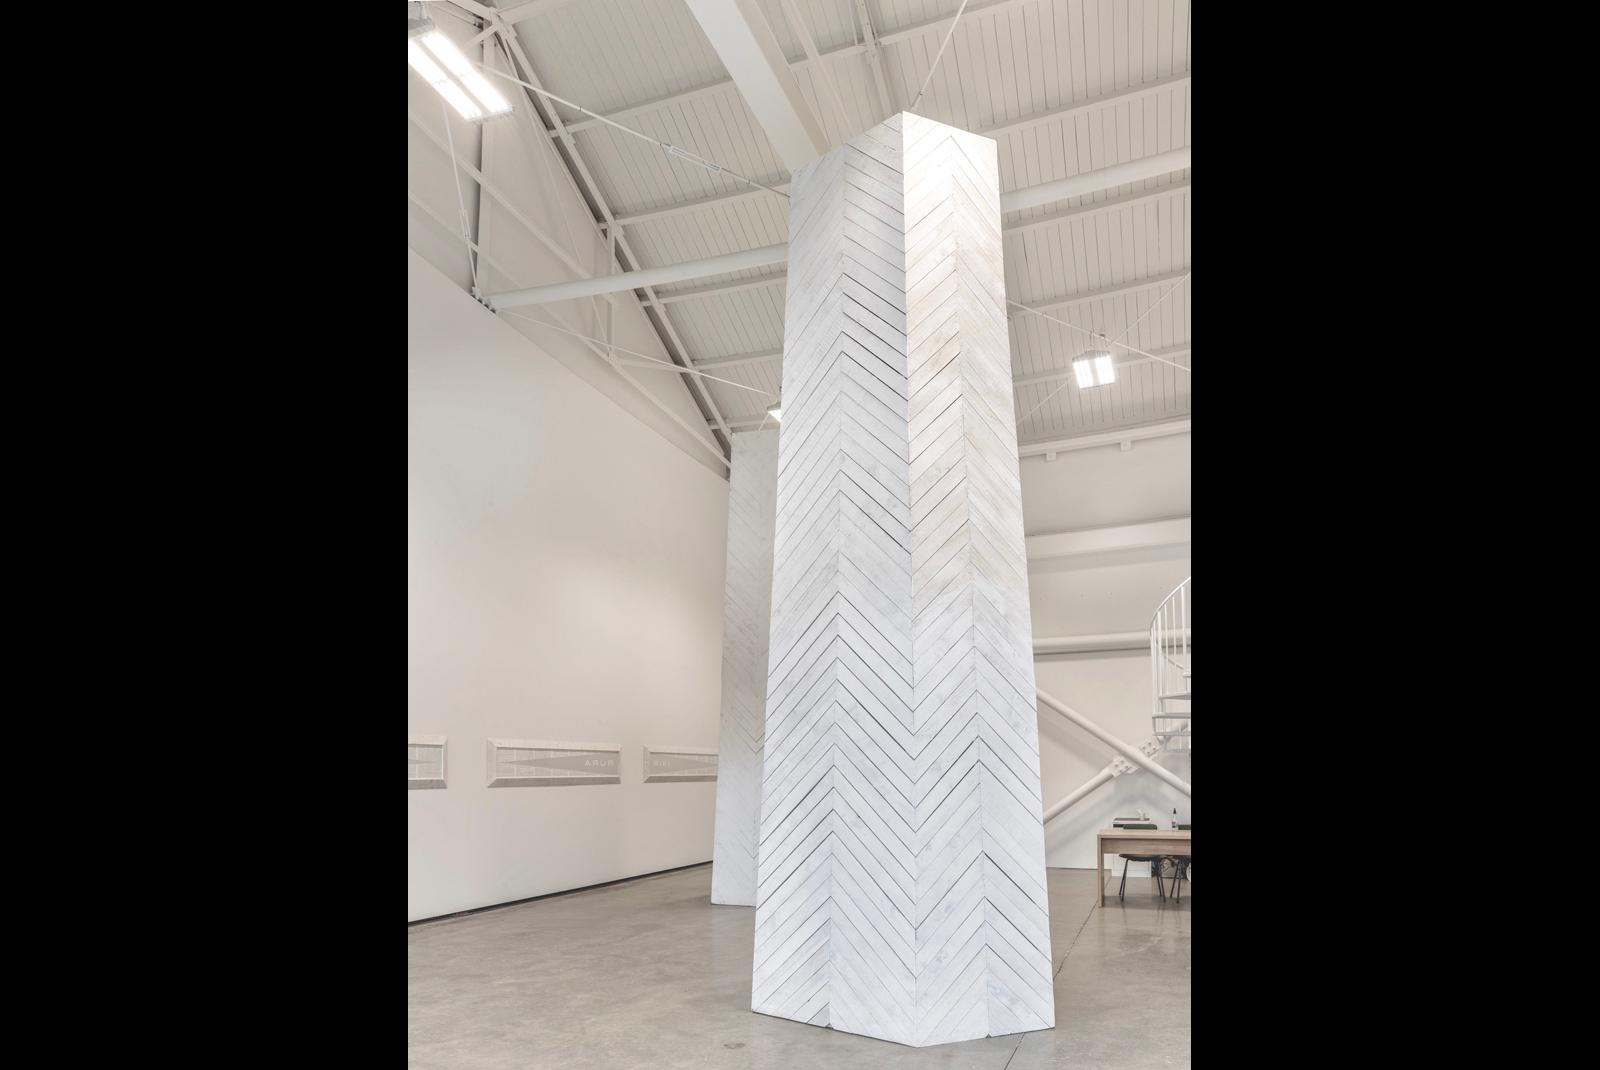 Properties of Peace and Evil, installation by New Zealand artist Brett Graham